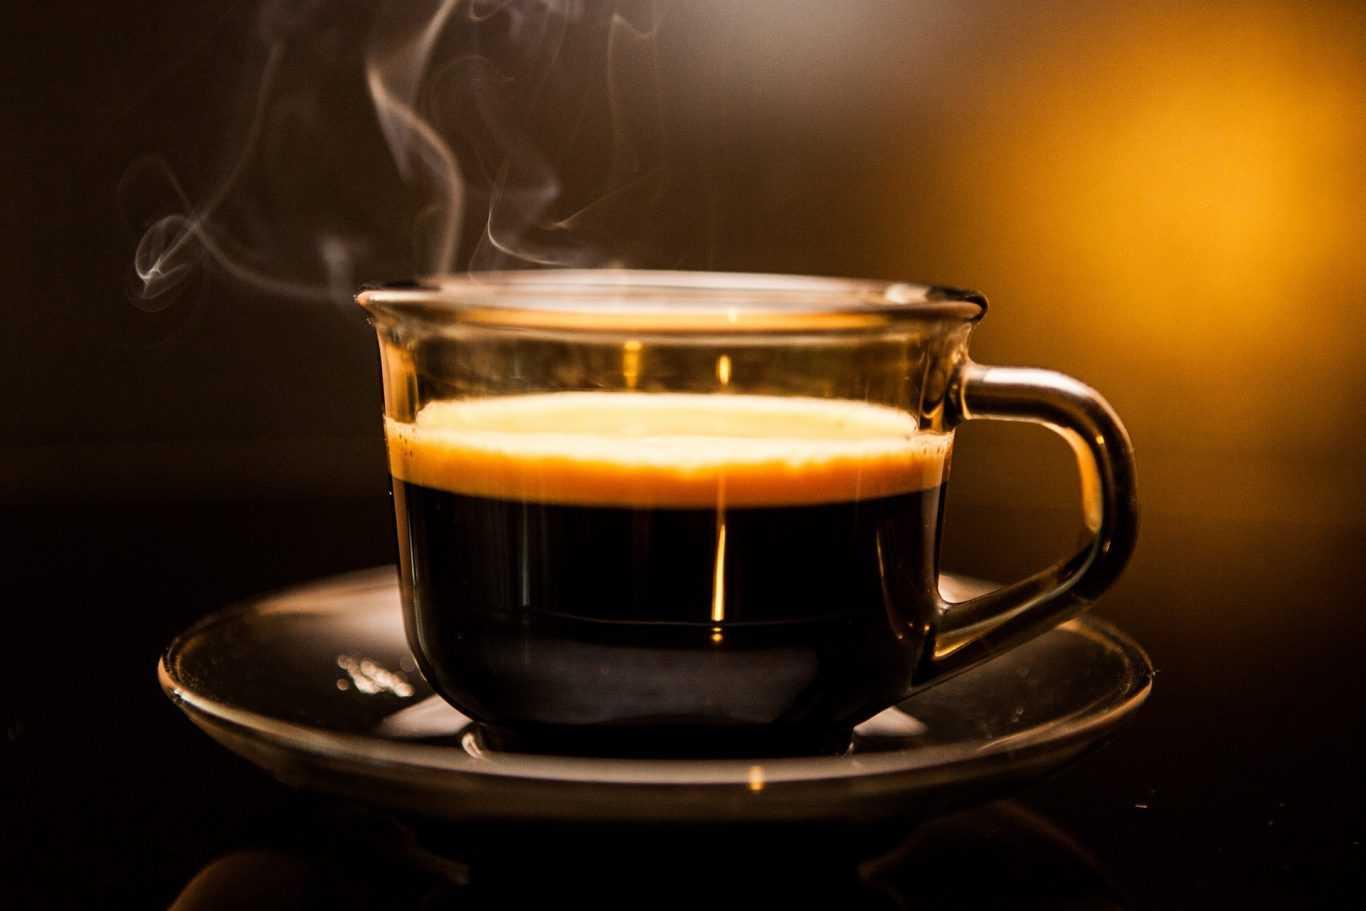 kawy-mielone-ziarniste-palone-cafe-creator-sklep-producent-17